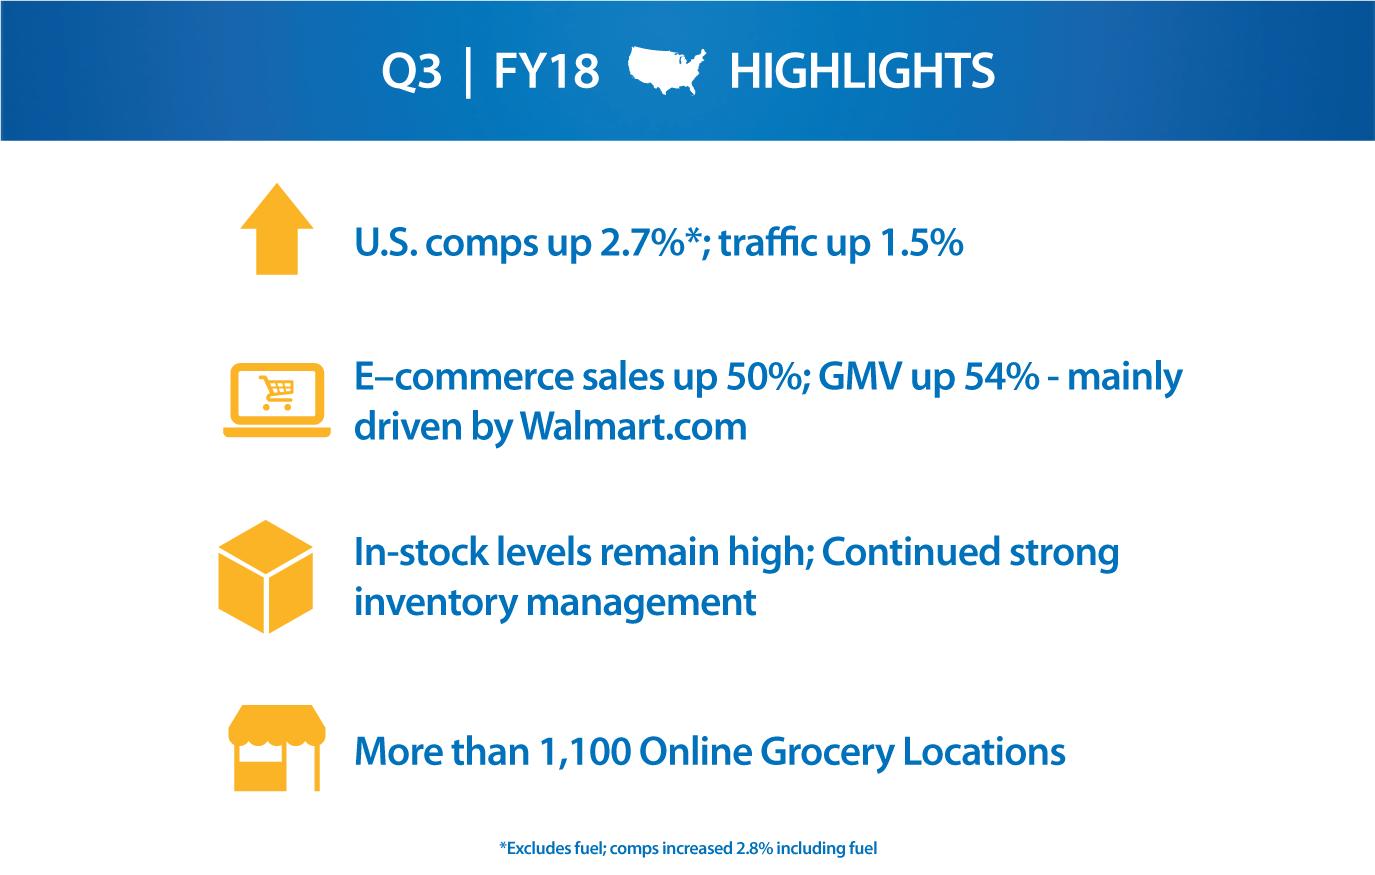 Walmart U.S. - FY18 Q3 Highlights